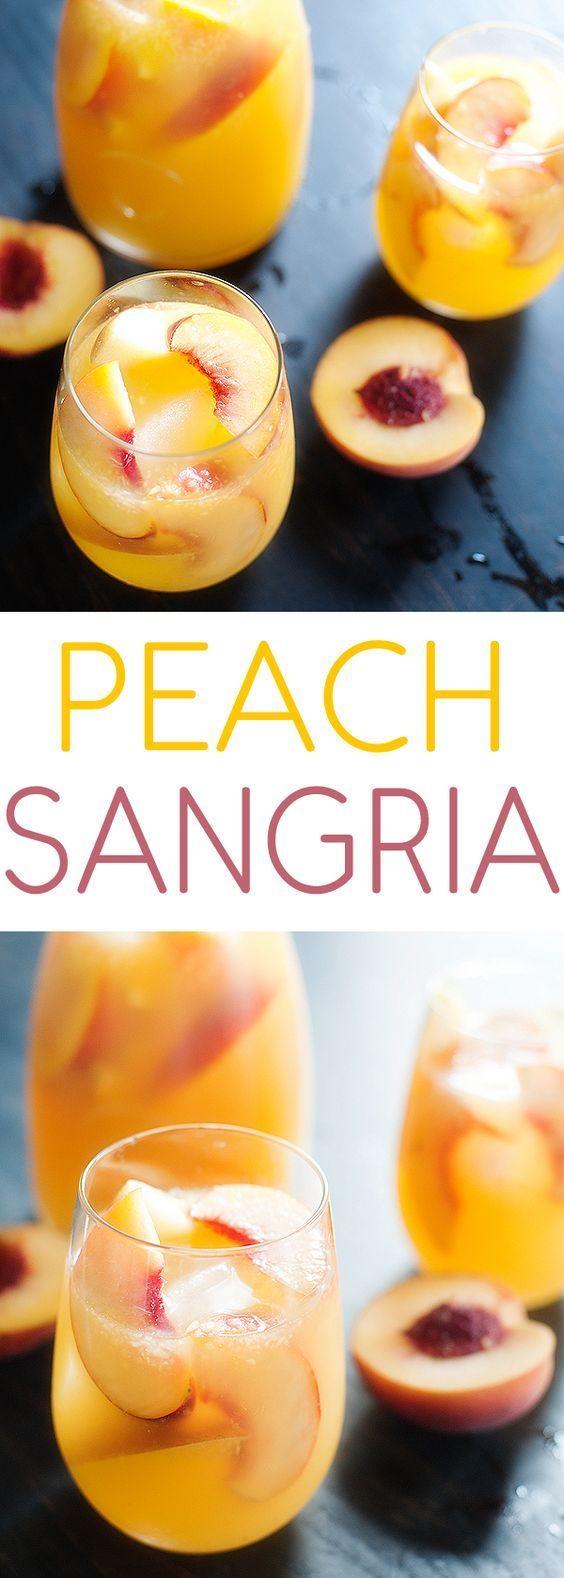 Wedding - Peach Sangria